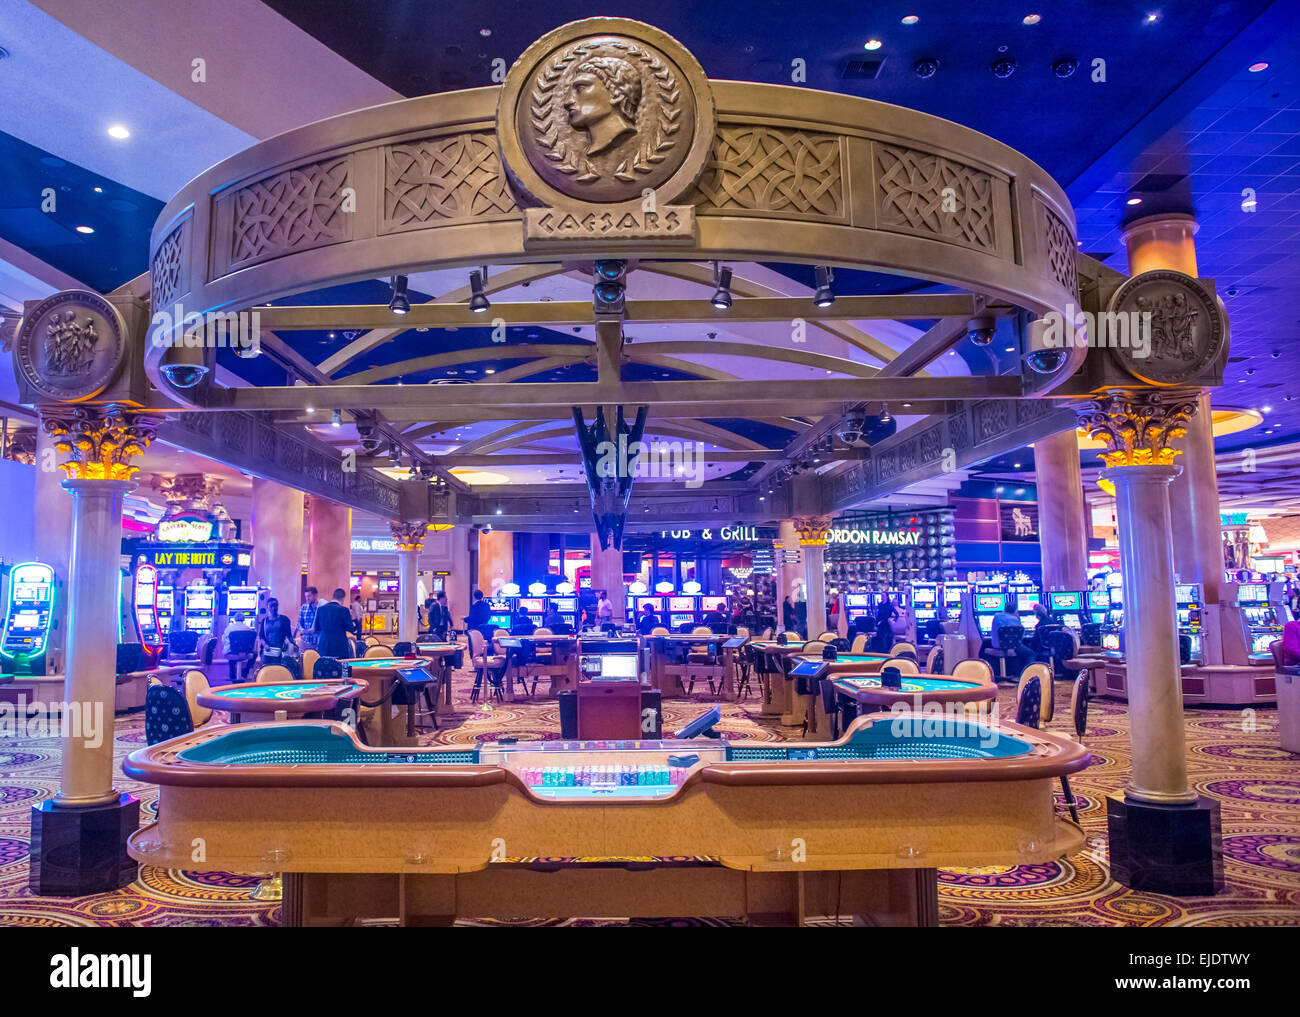 caesars palace online casino sizzling hot online gratis